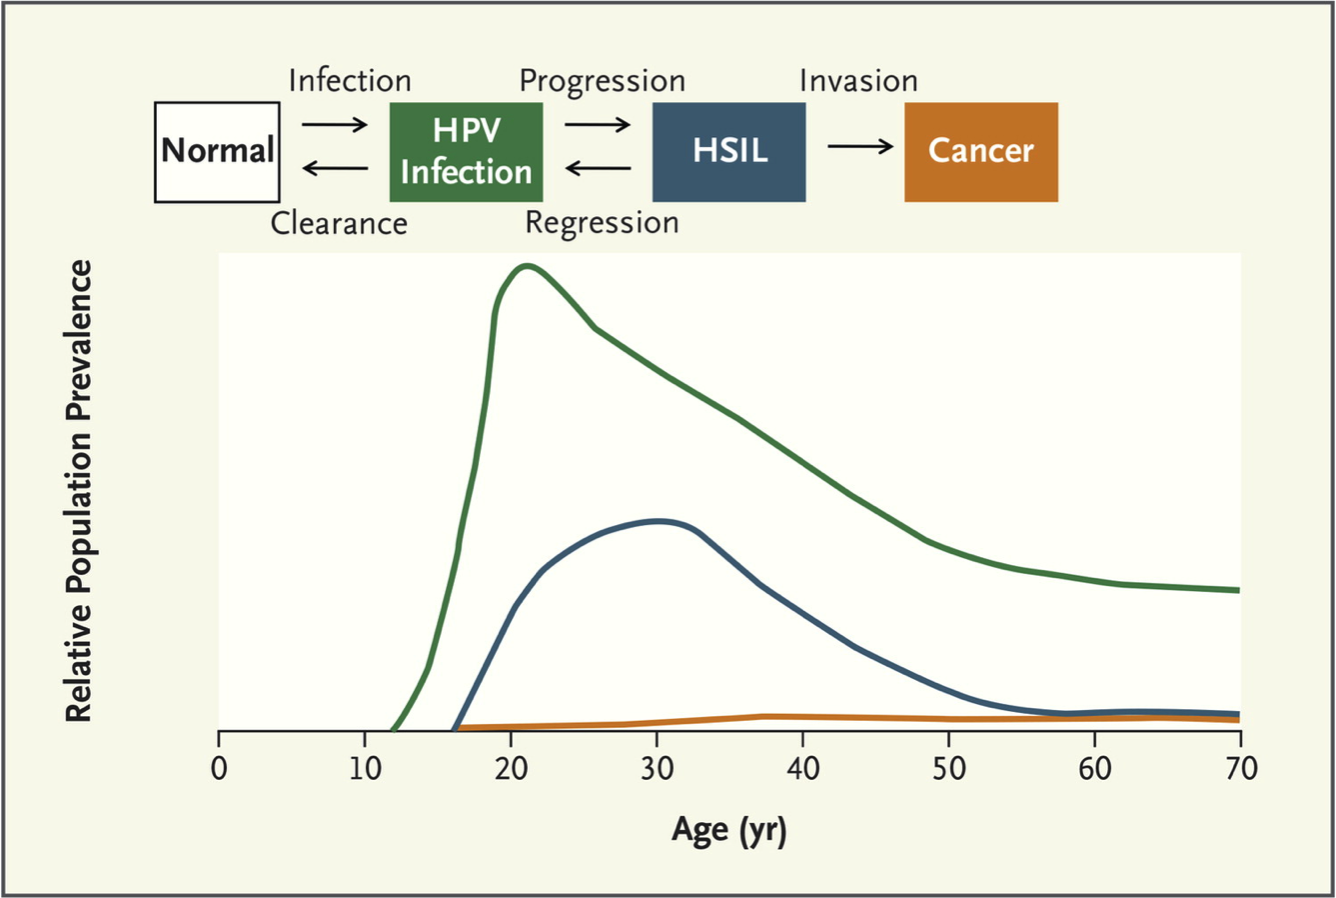 Human papillomavirus prevalence - Management in Health, Vol 17, No 2 ()